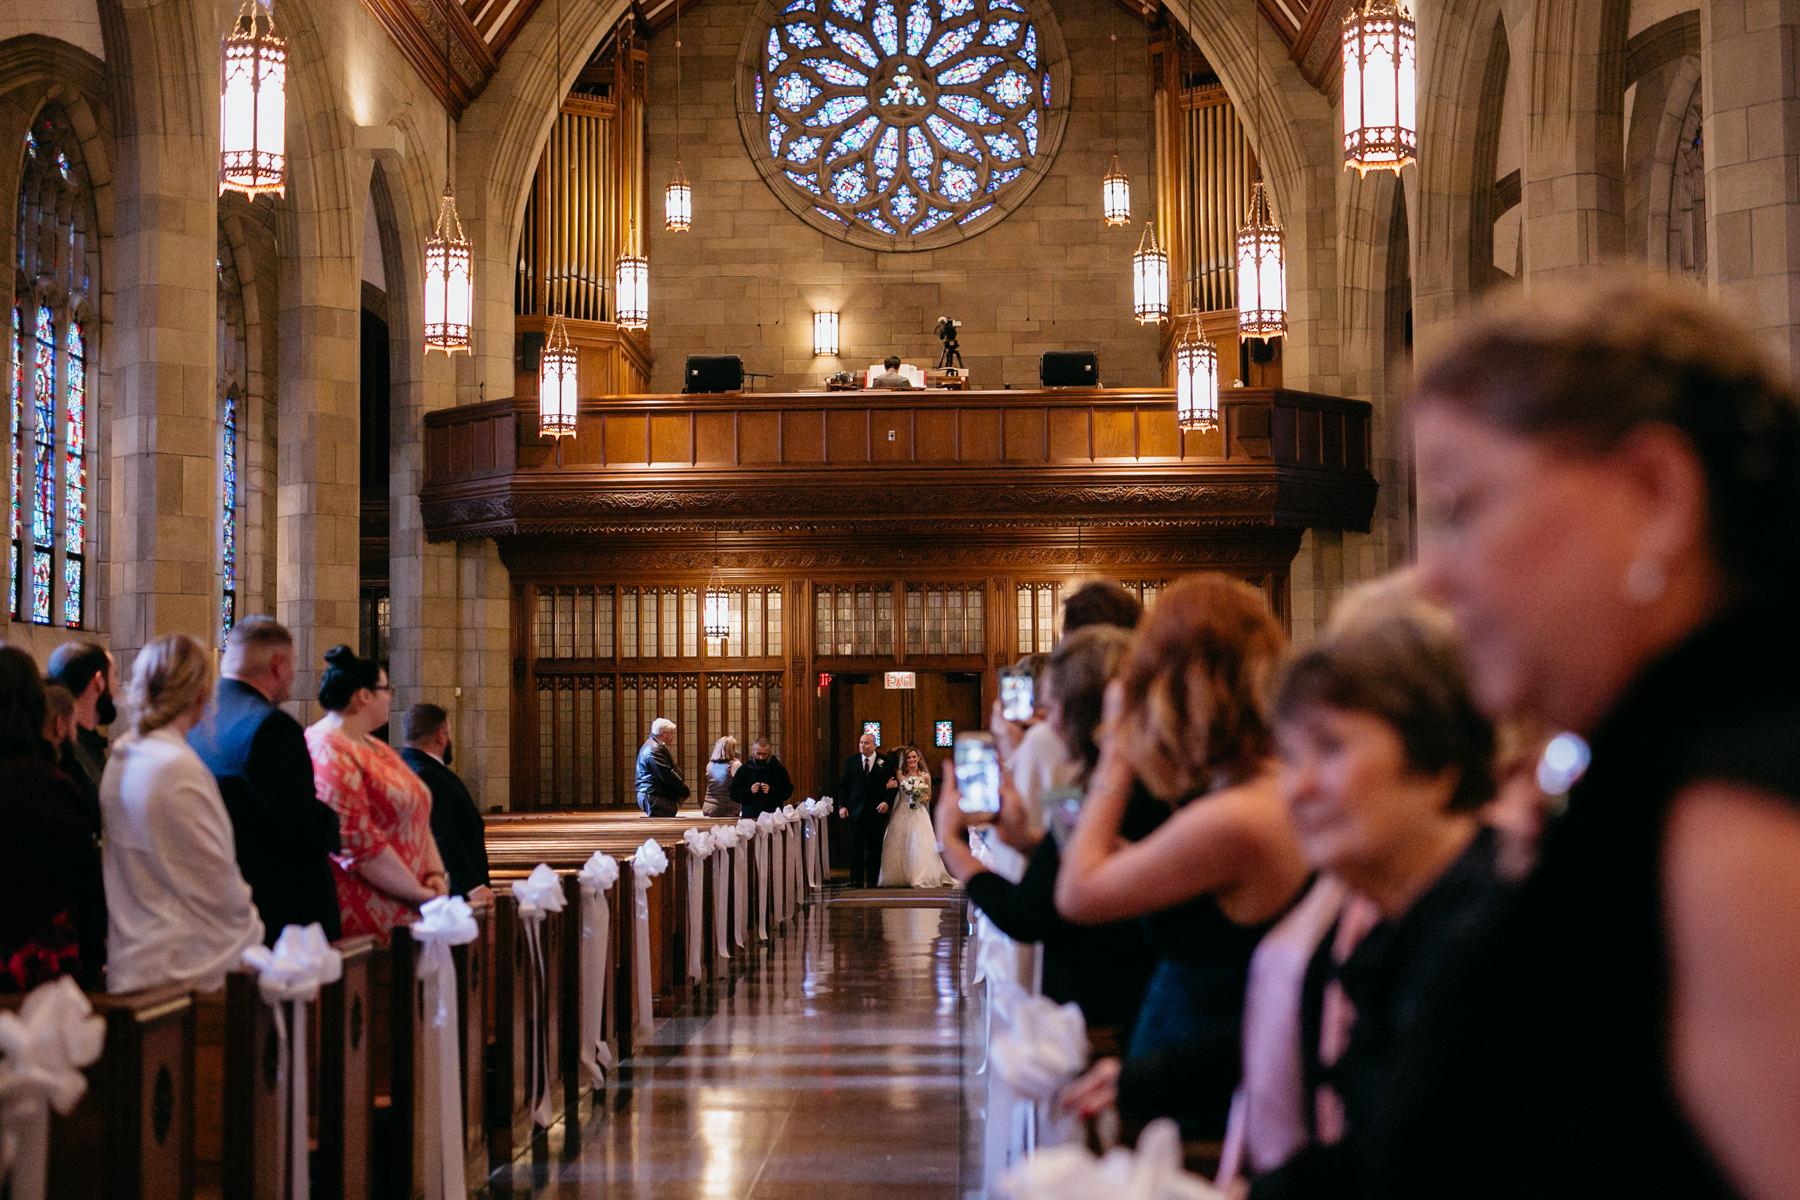 Quincy Ma Massachusetts Wedding Dedham Boston Granie Links Wedding New England Catholic Cathedral Liz Osban Photography 34.jpg